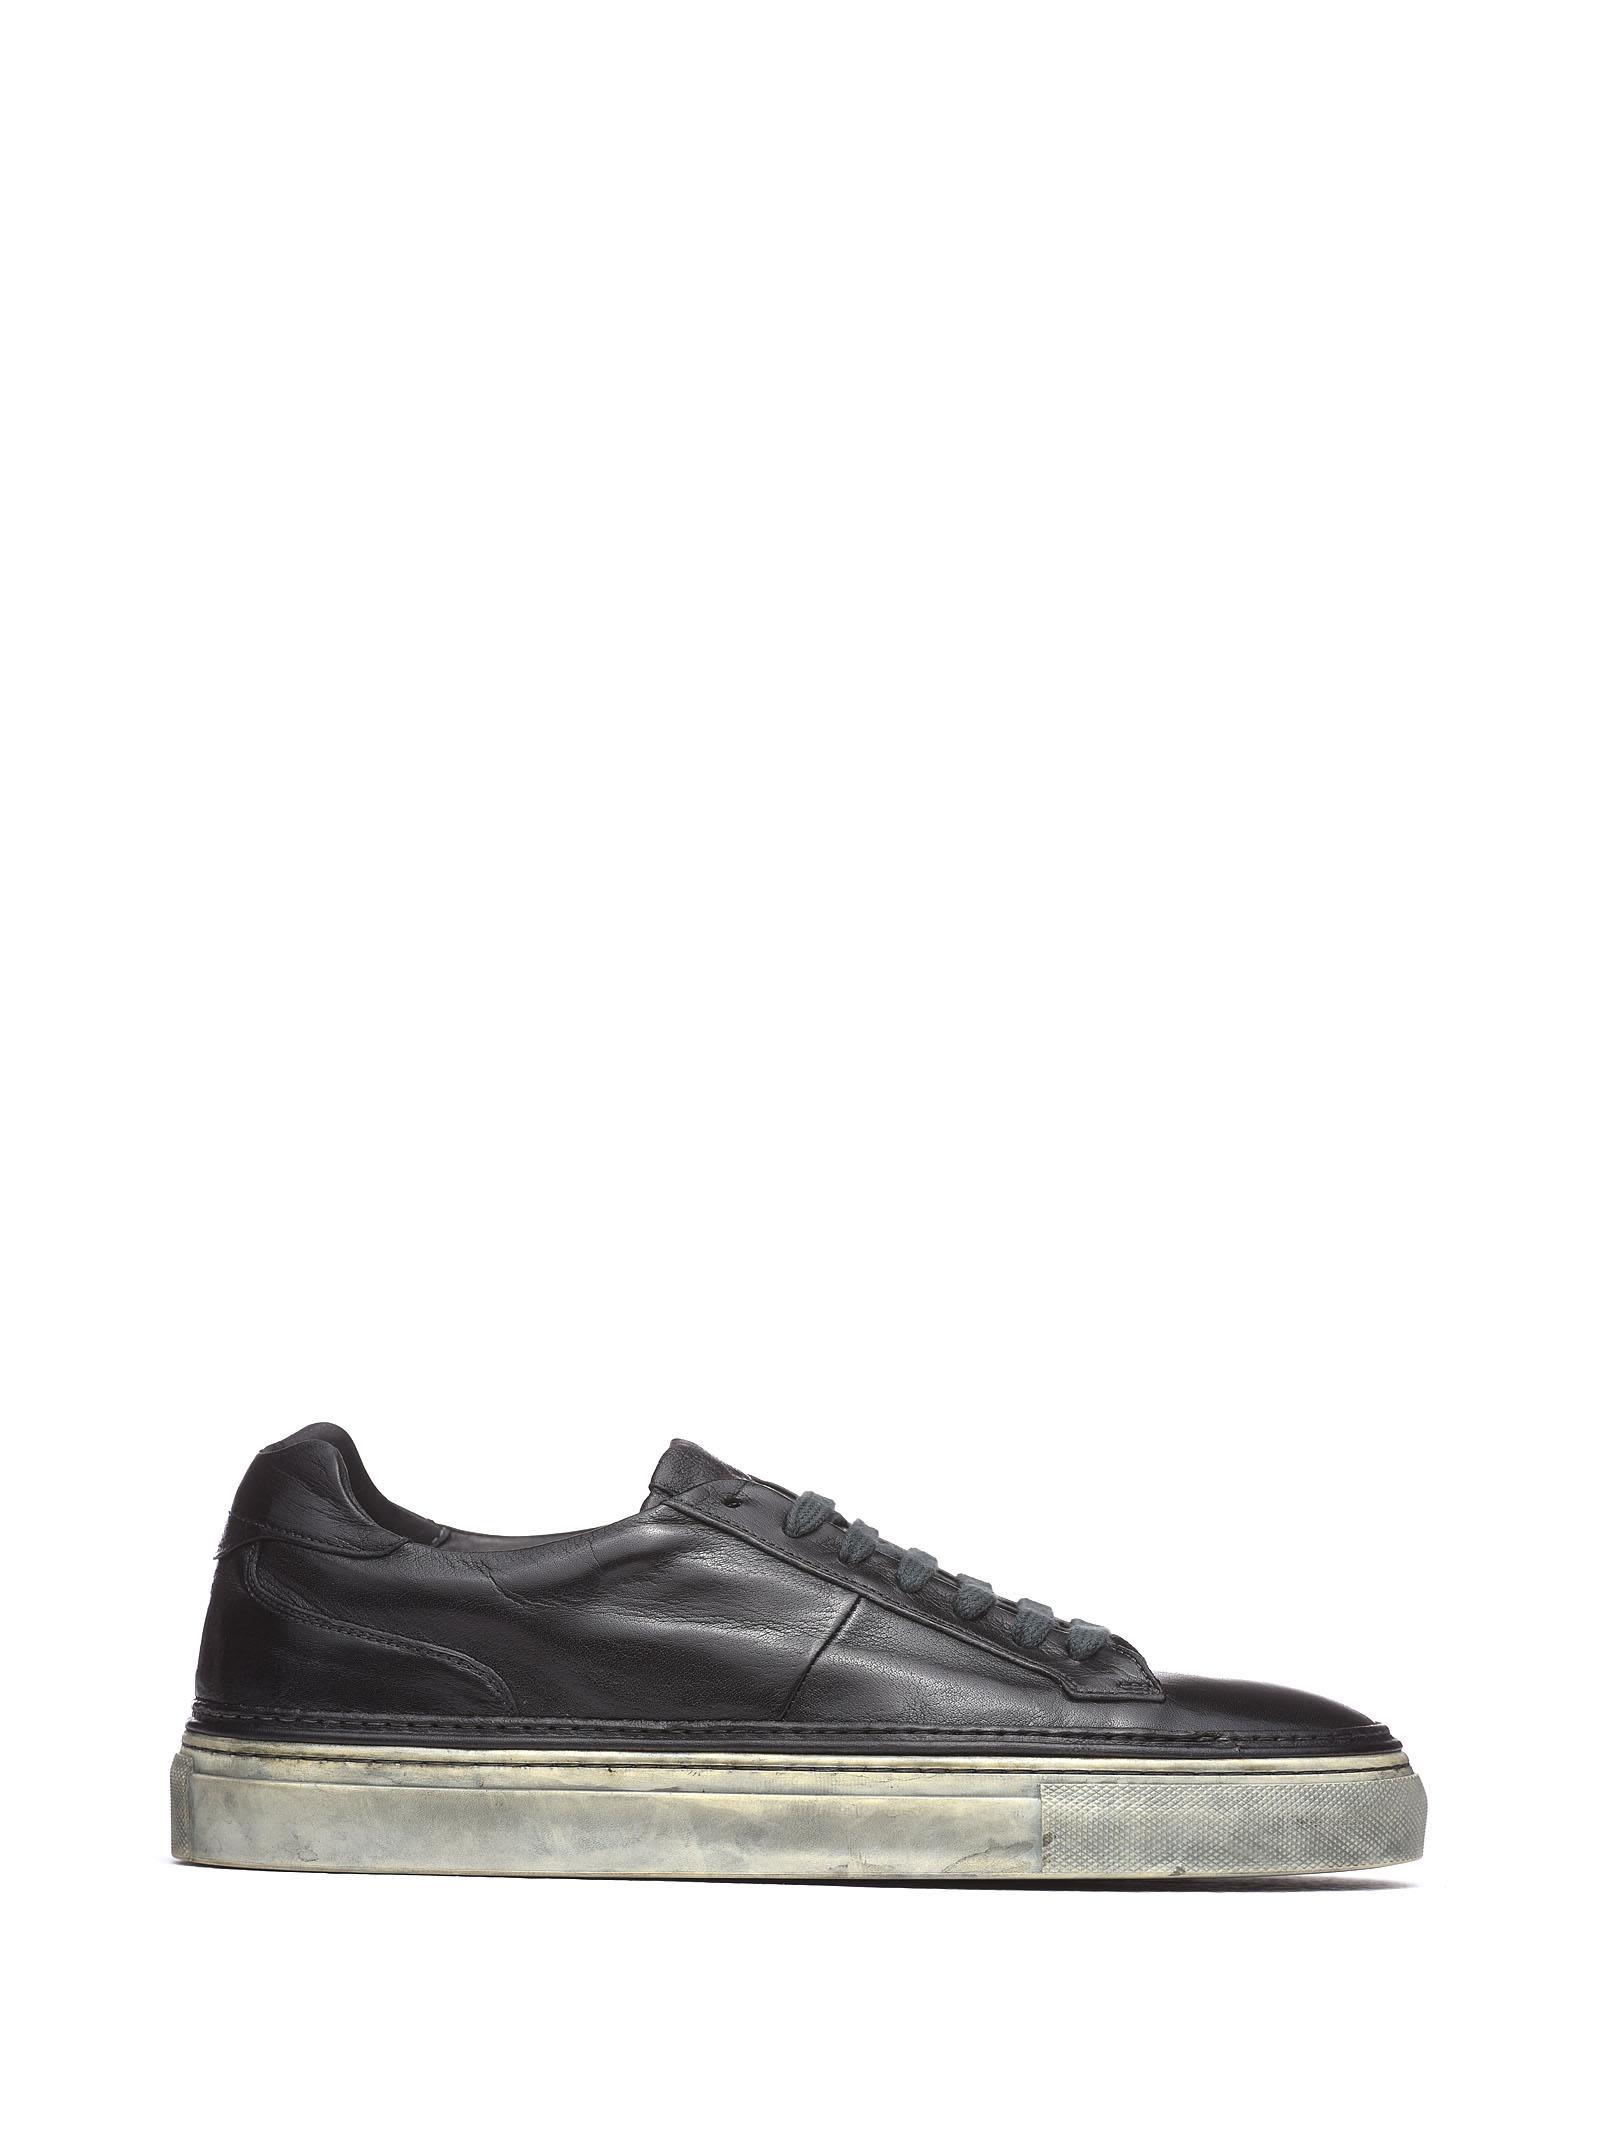 CORVARI Black Leather Sneakers in Nero